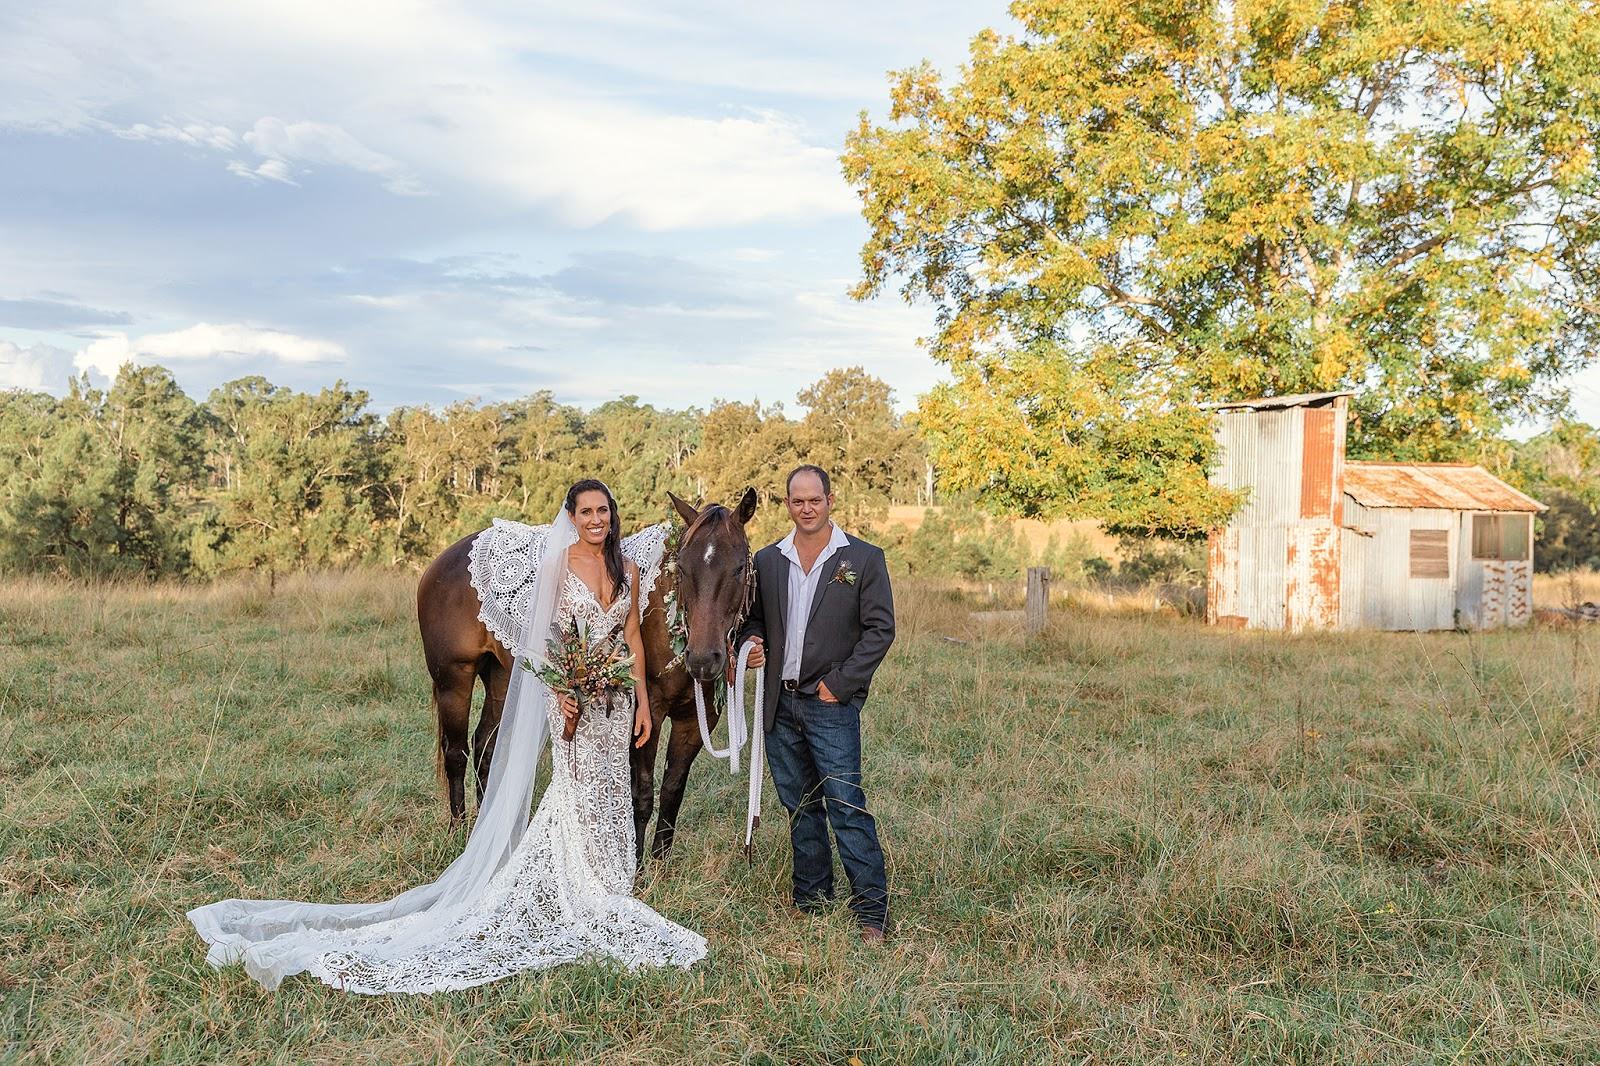 DENIS BANKS PHOTOGRAPHY COUNTRY BOHO WEDDINGS